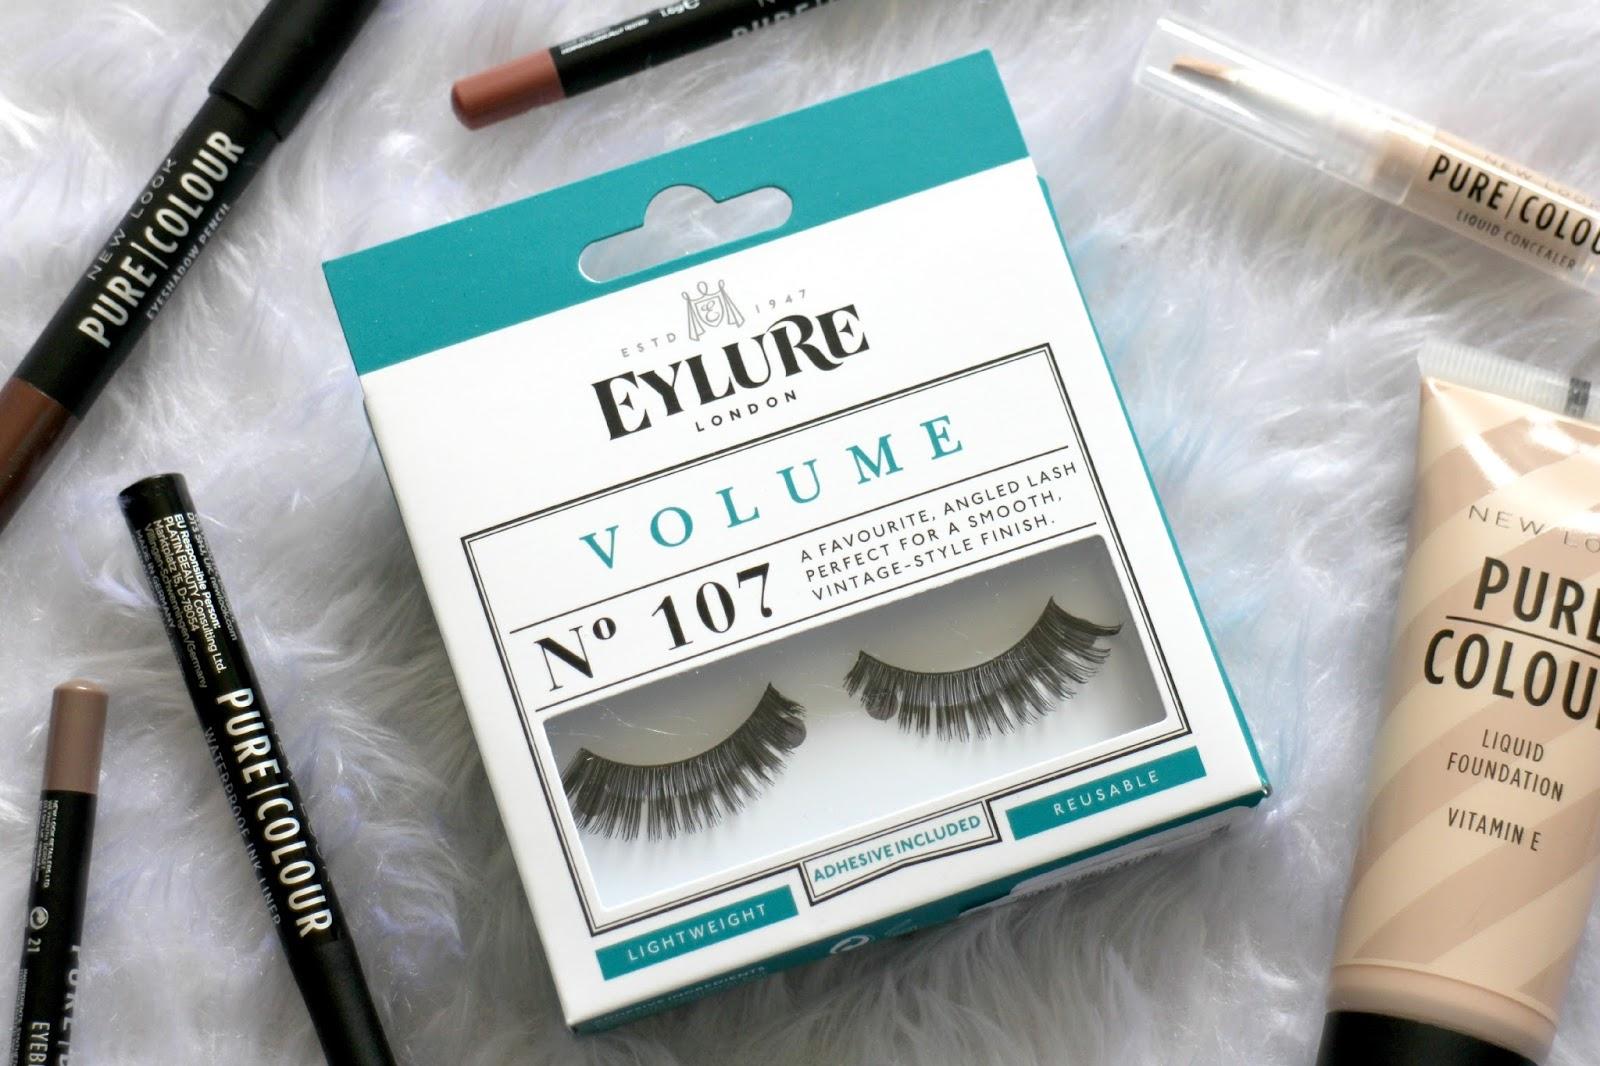 Eylure London Black No 107 Natural False Lashes